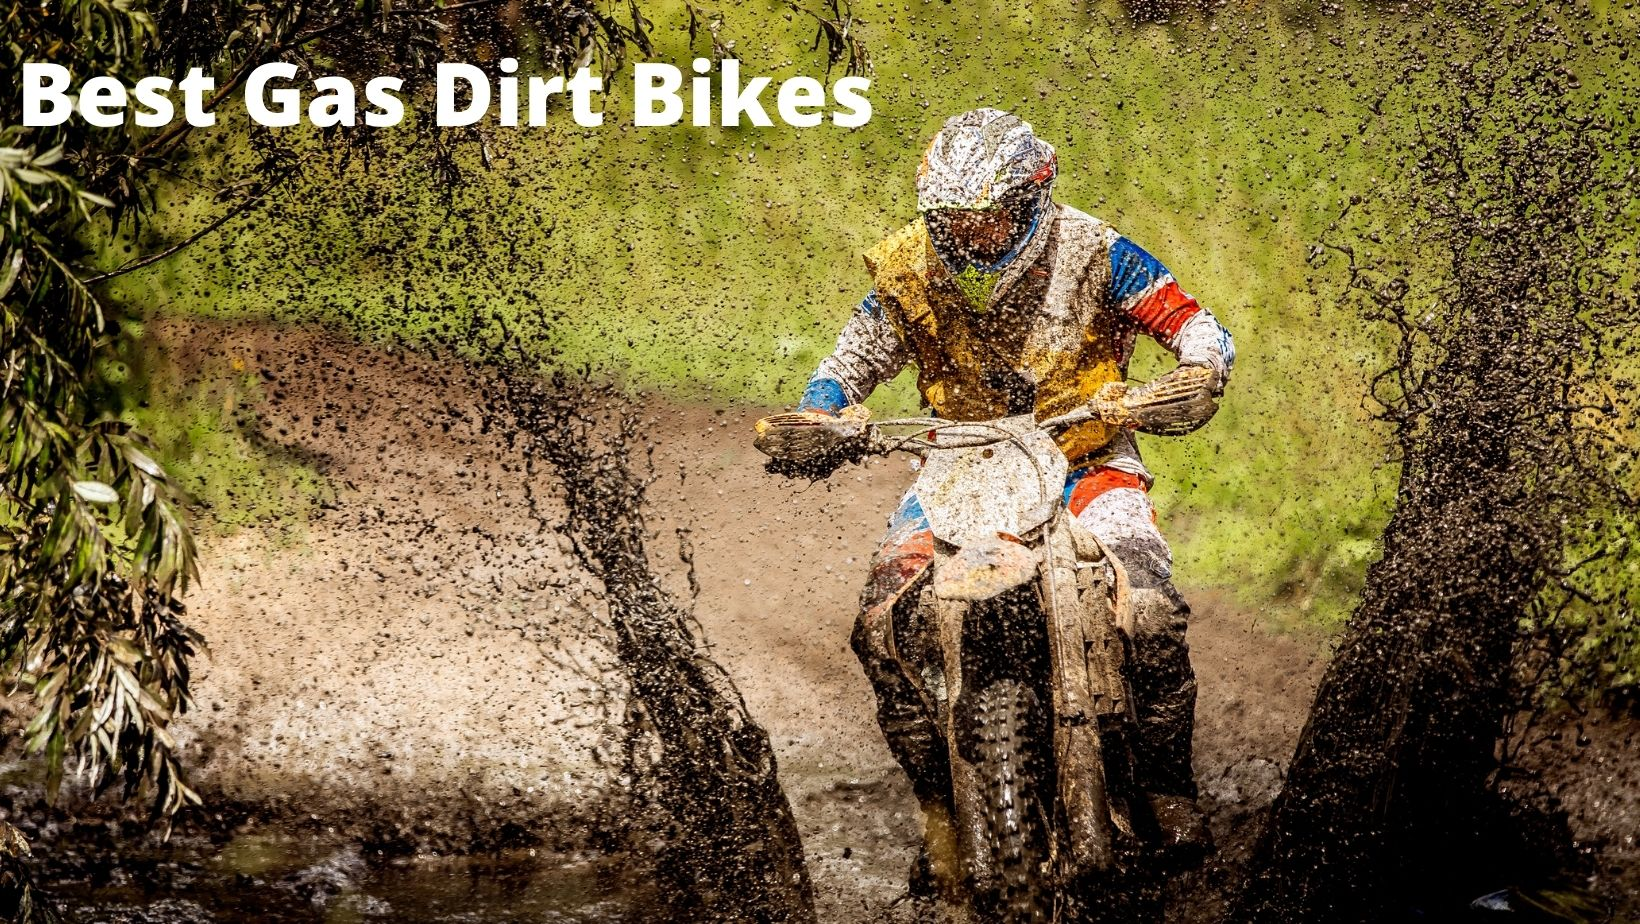 Best Gas Dirt Bikes